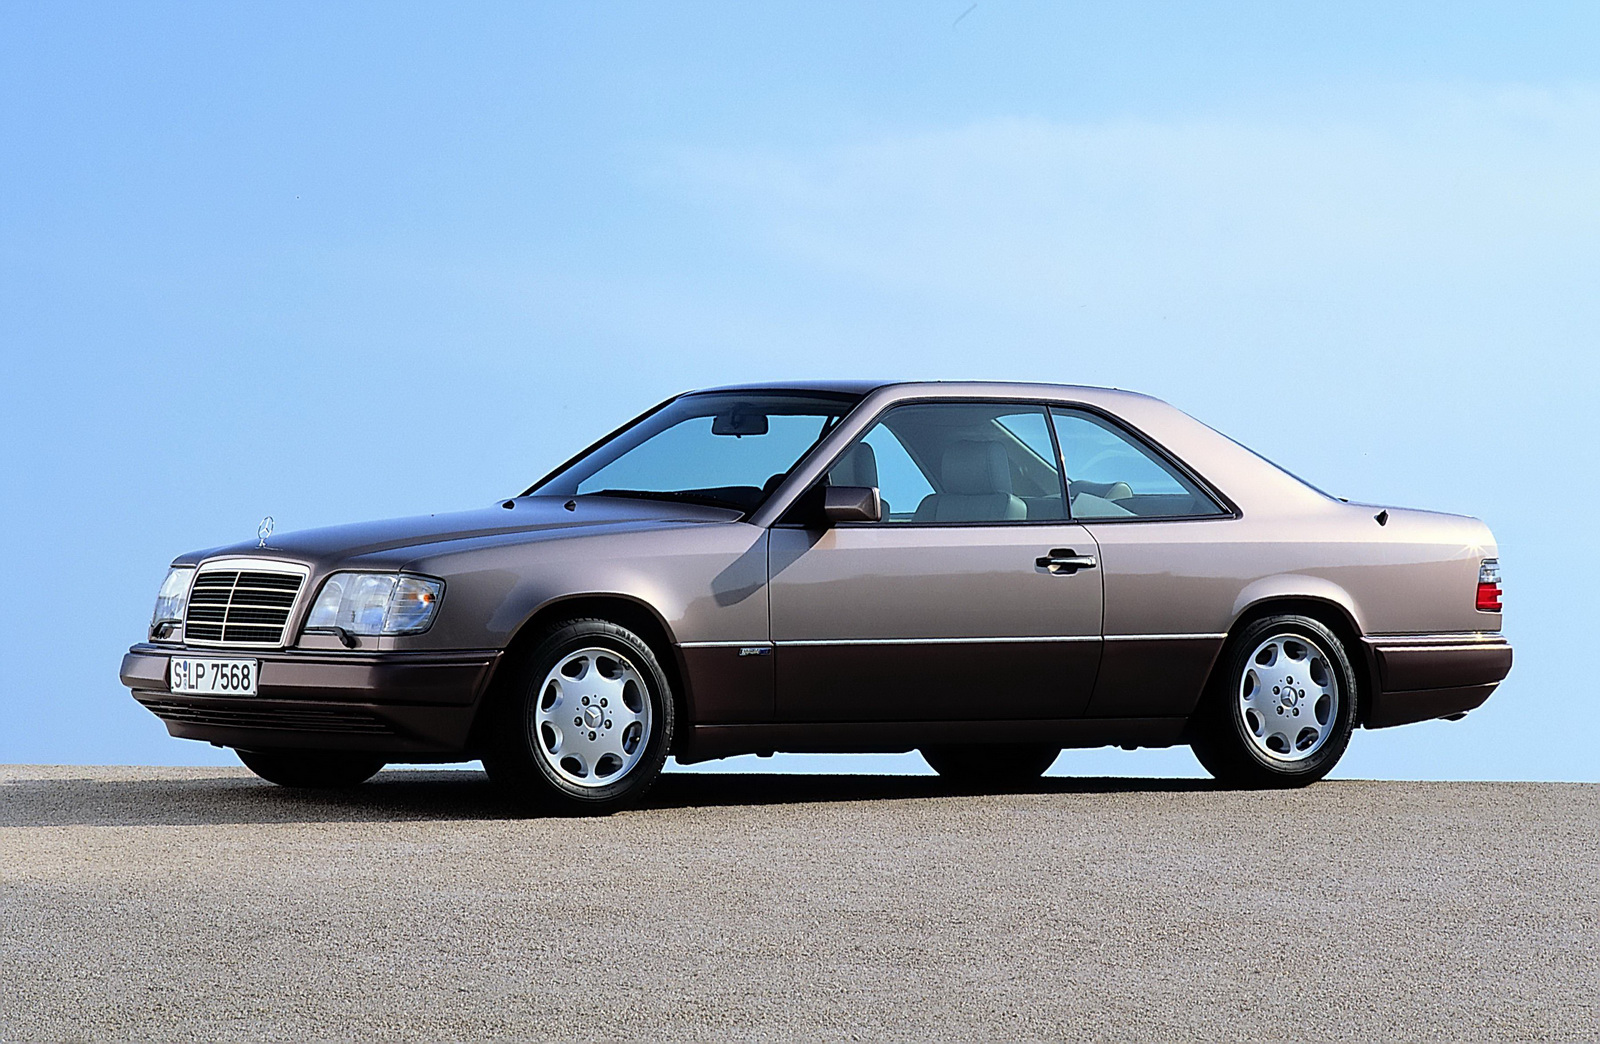 Mercedes-Benz E-klasse AMG I (W124) 1993 - 1996 Coupe-Hardtop #1